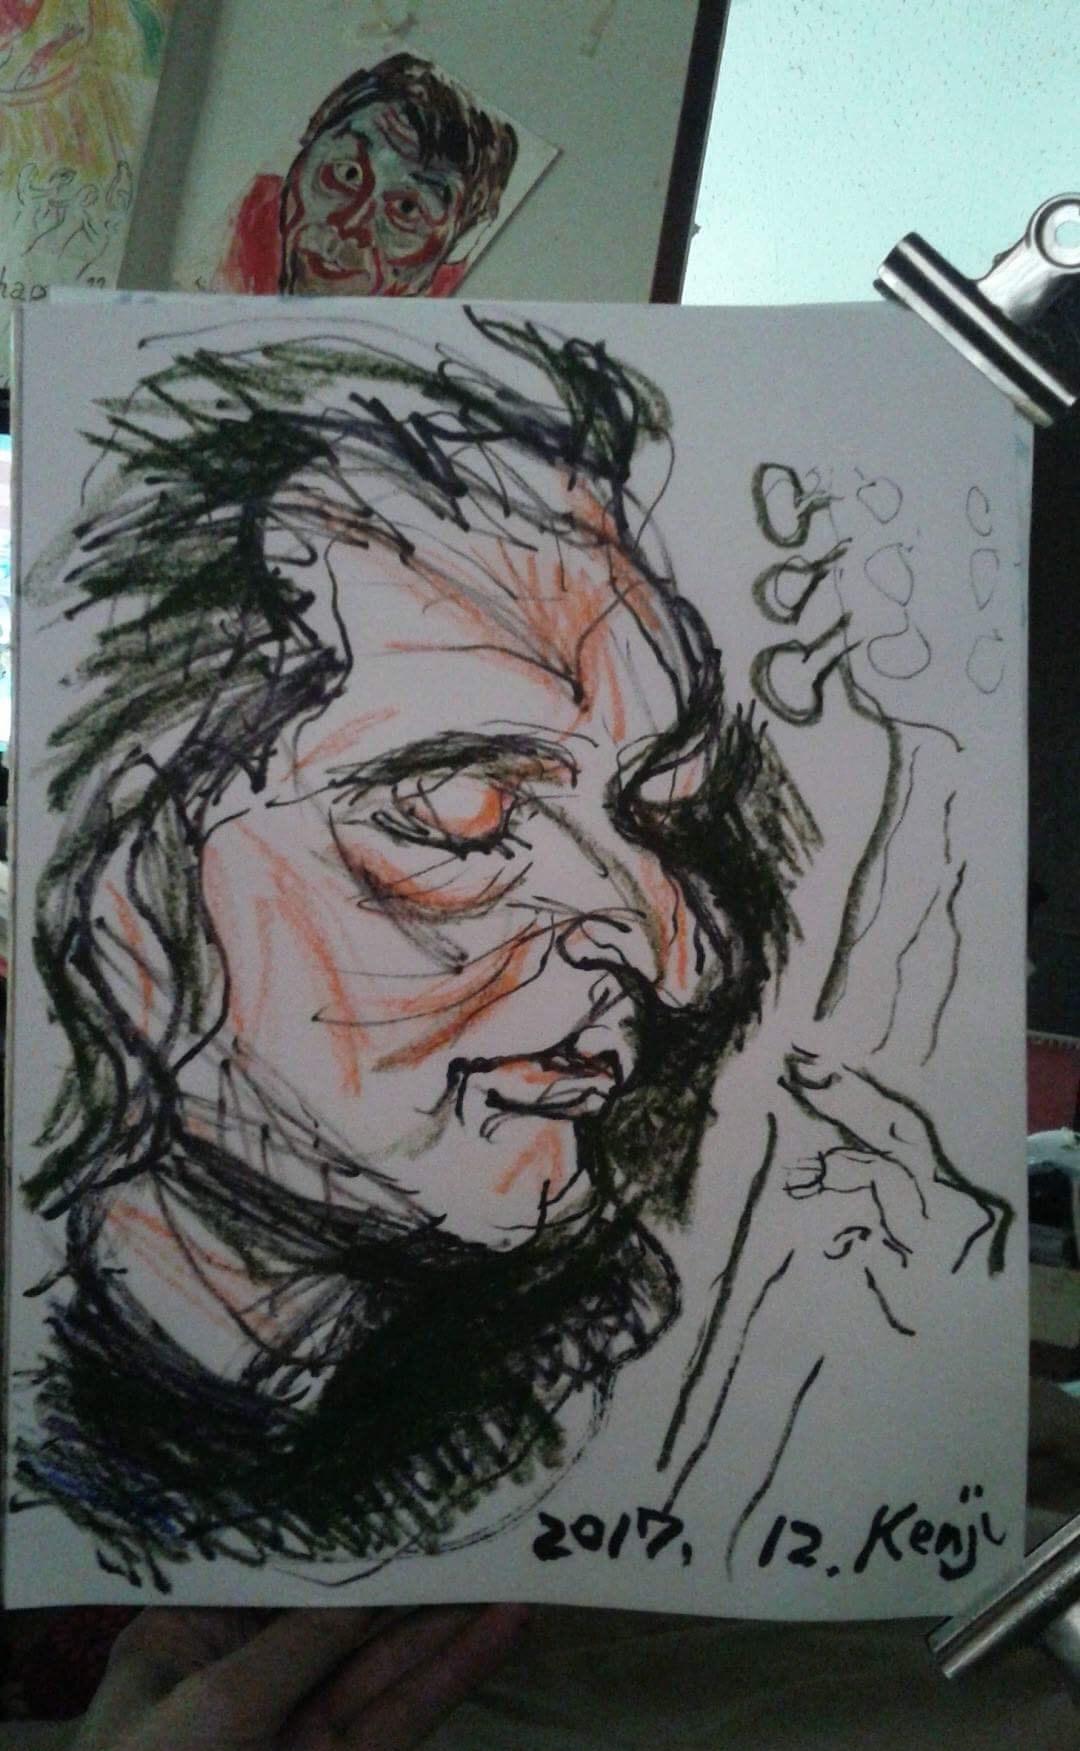 Kenji Tanaka, Dario Chillemi's portrait.